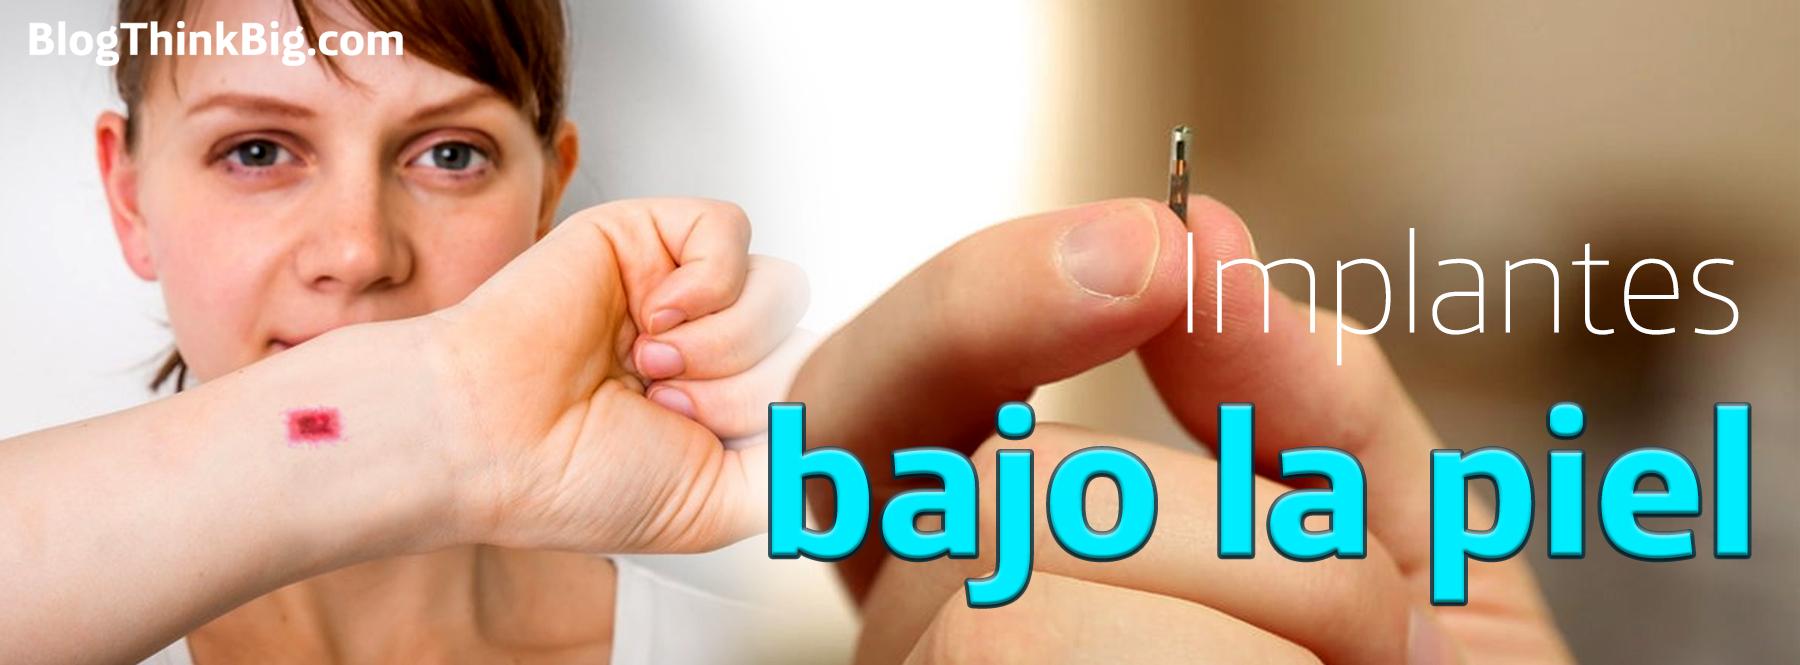 Implantes-inteligentes-bajo-la-piel__